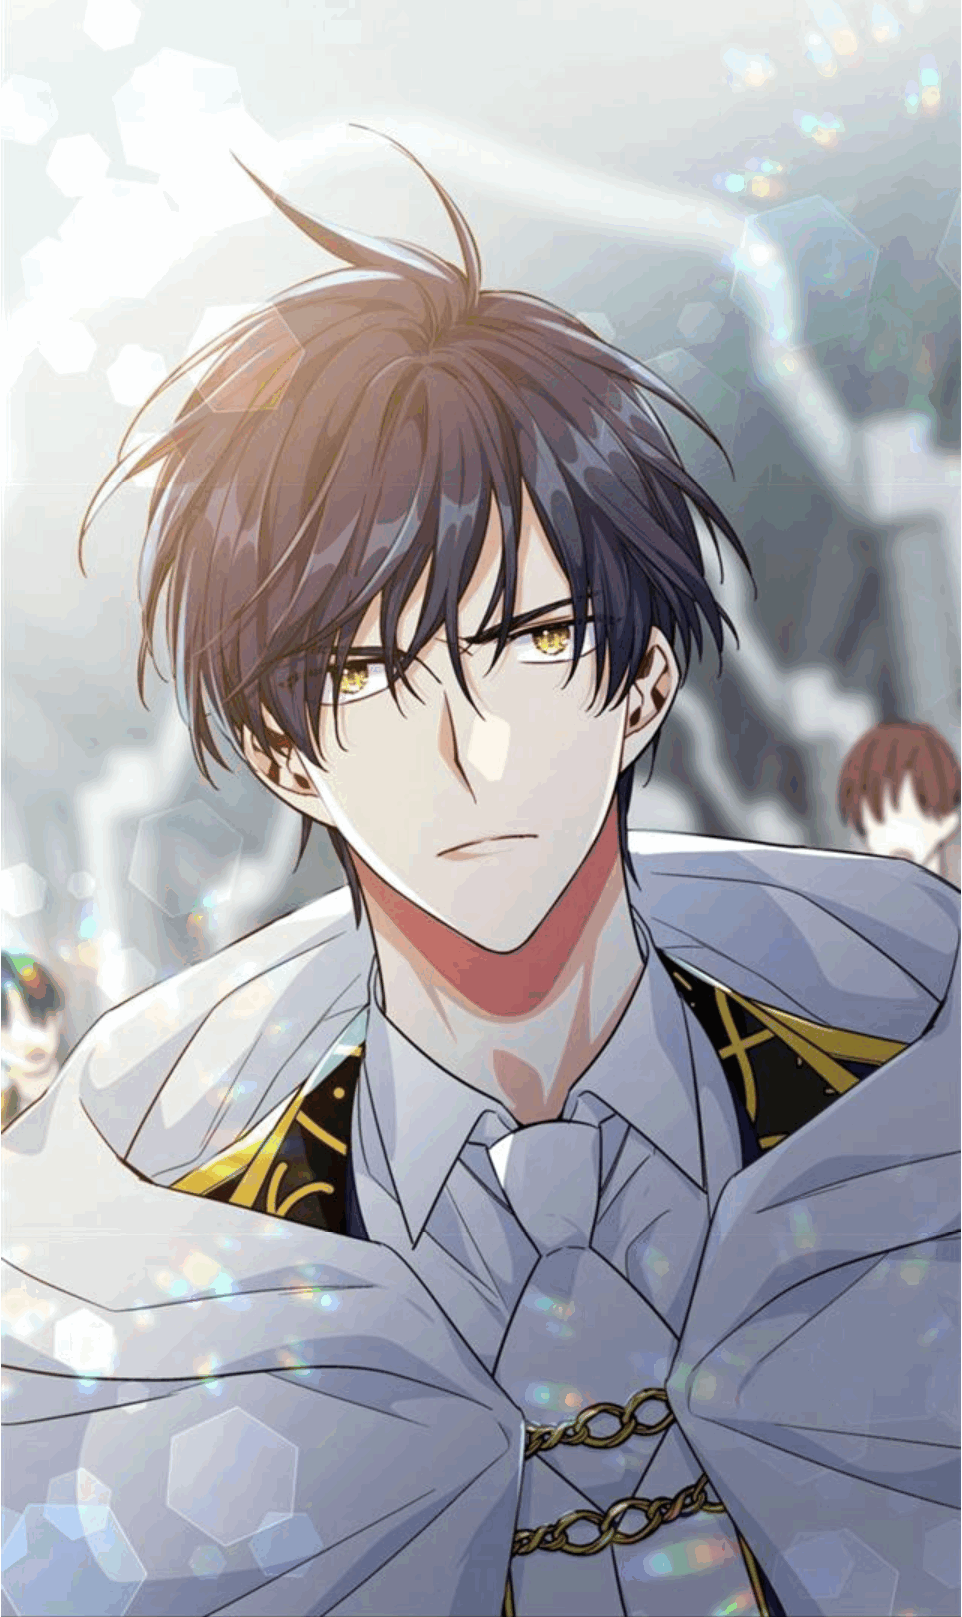 Anime&Manga Drawings ※에 있는 AESTHETICALLY PLEASING님의 핀